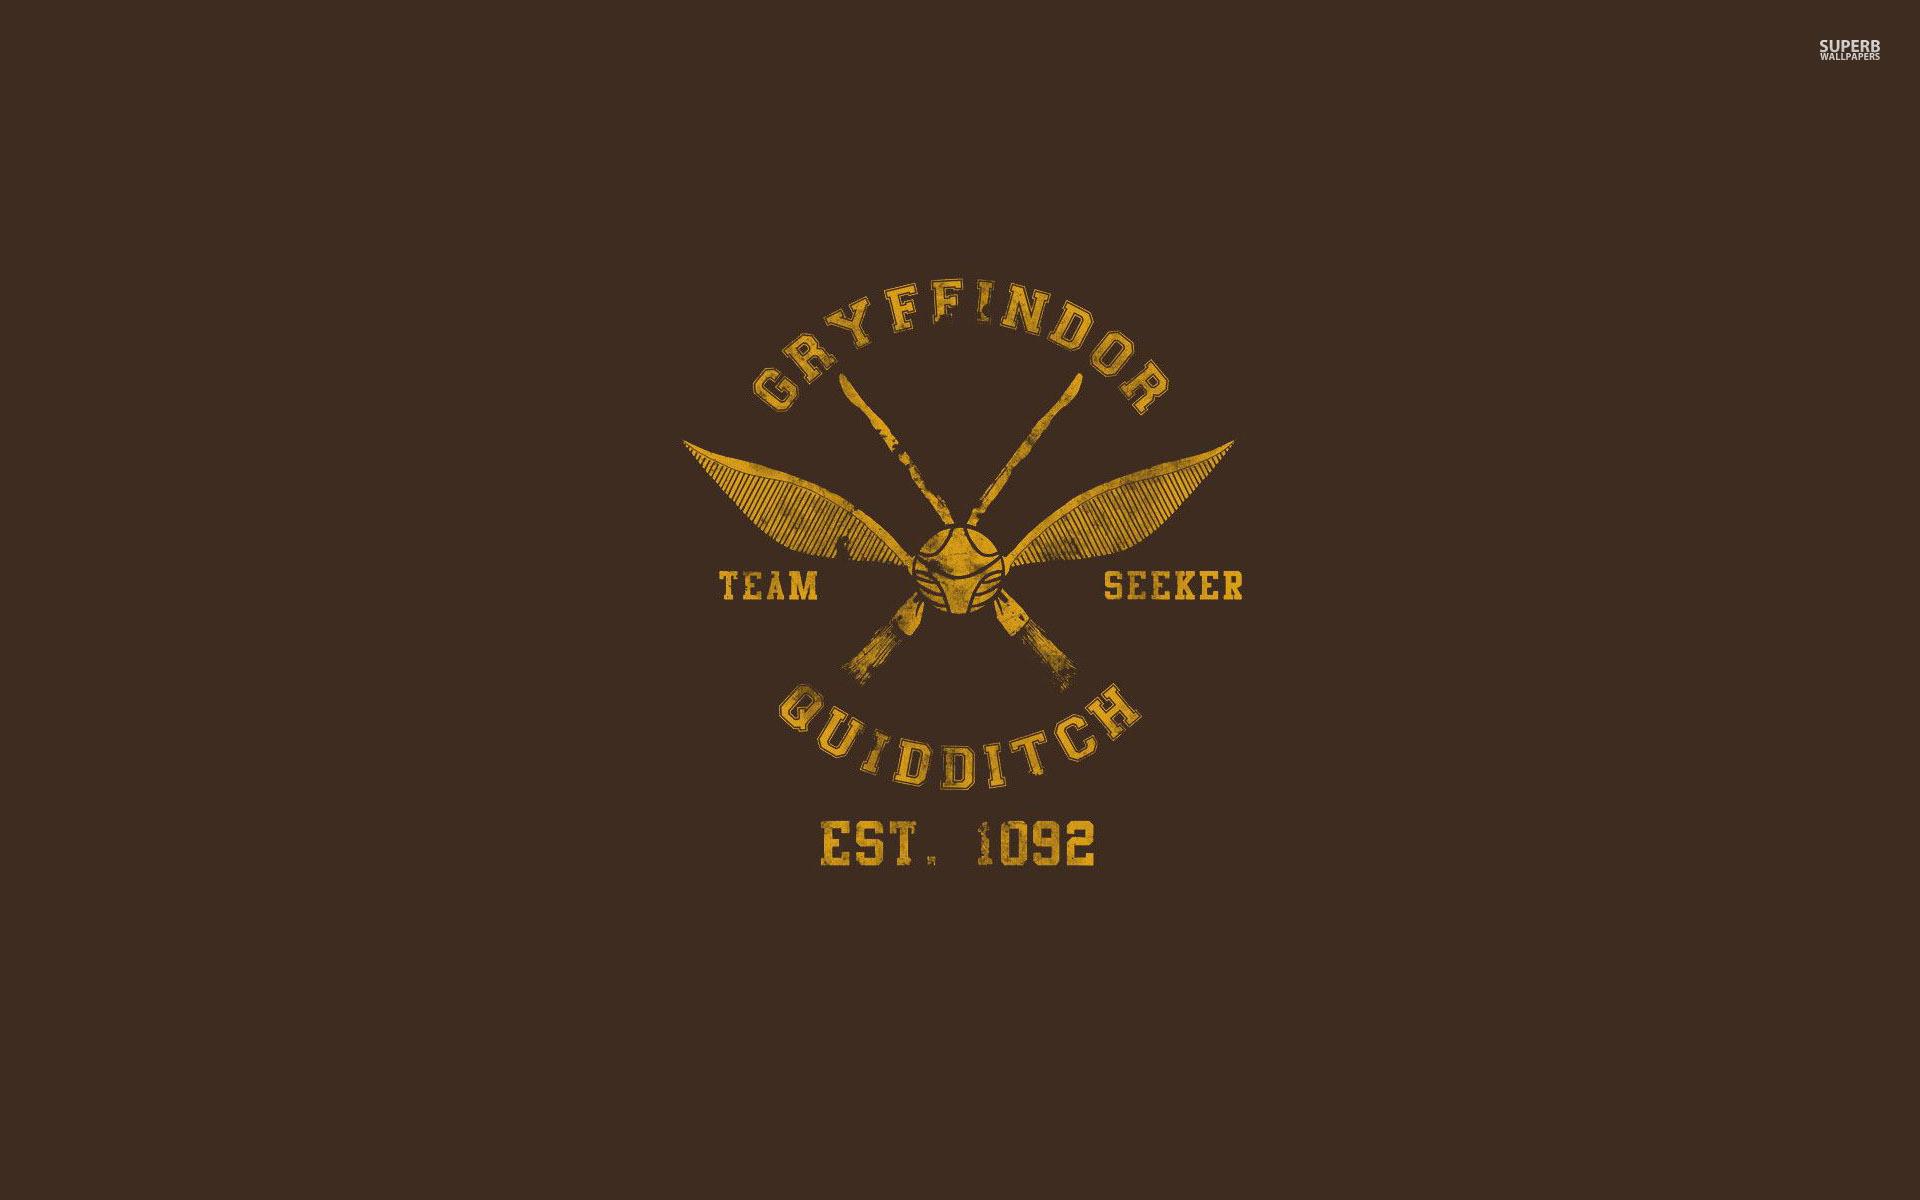 1920x1080 Harry Potter Hogwarts Crest Wallpaper